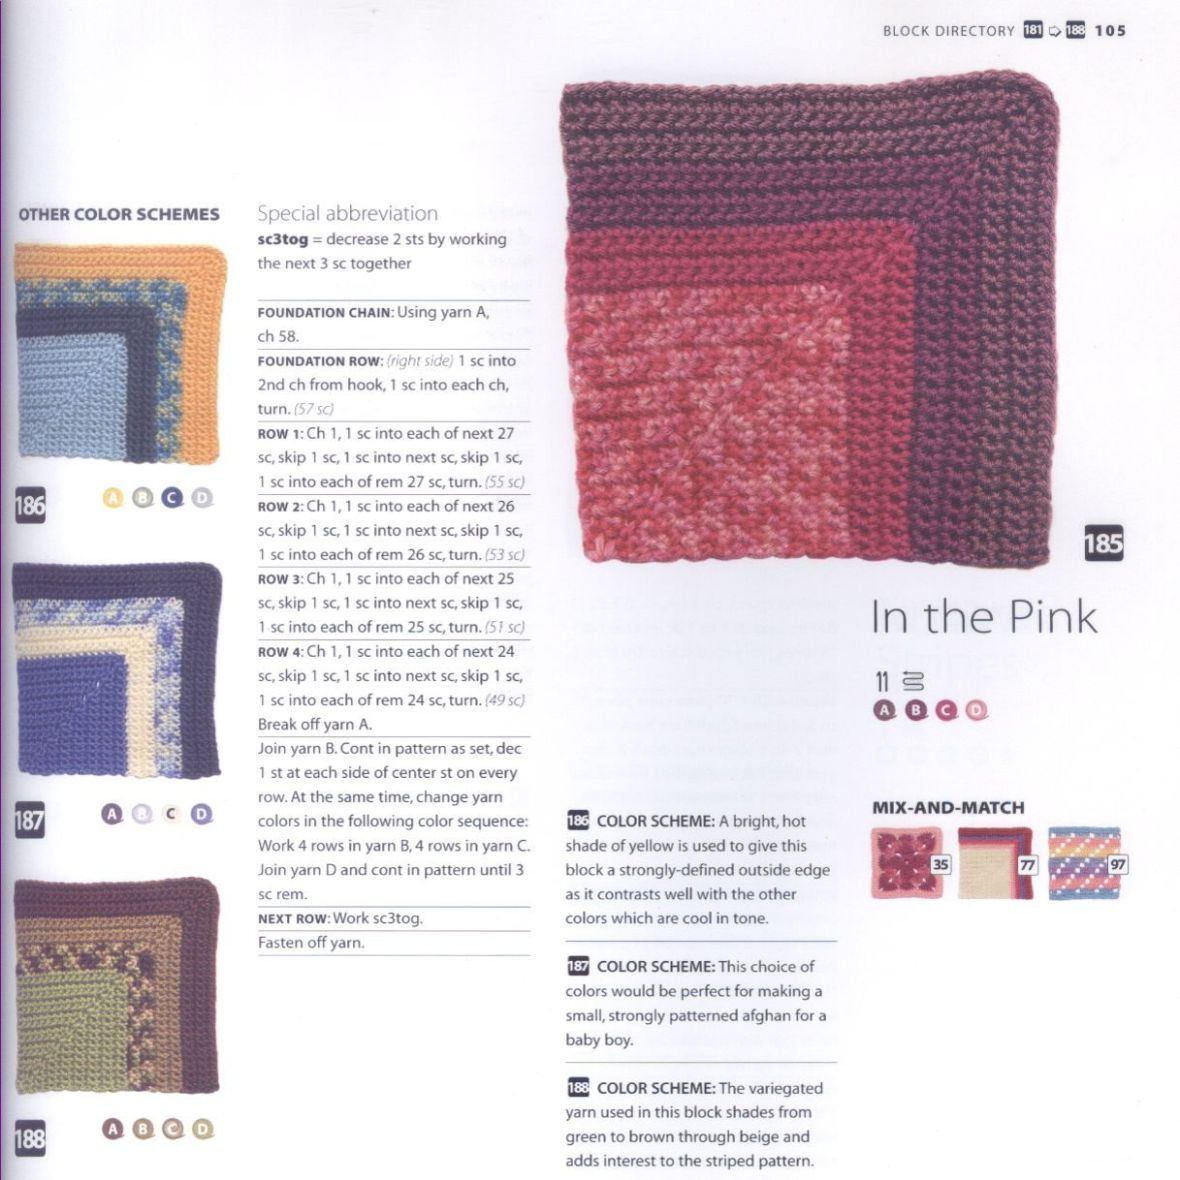 200 Crocheted Blocks for blankets, throws & Afghans 105